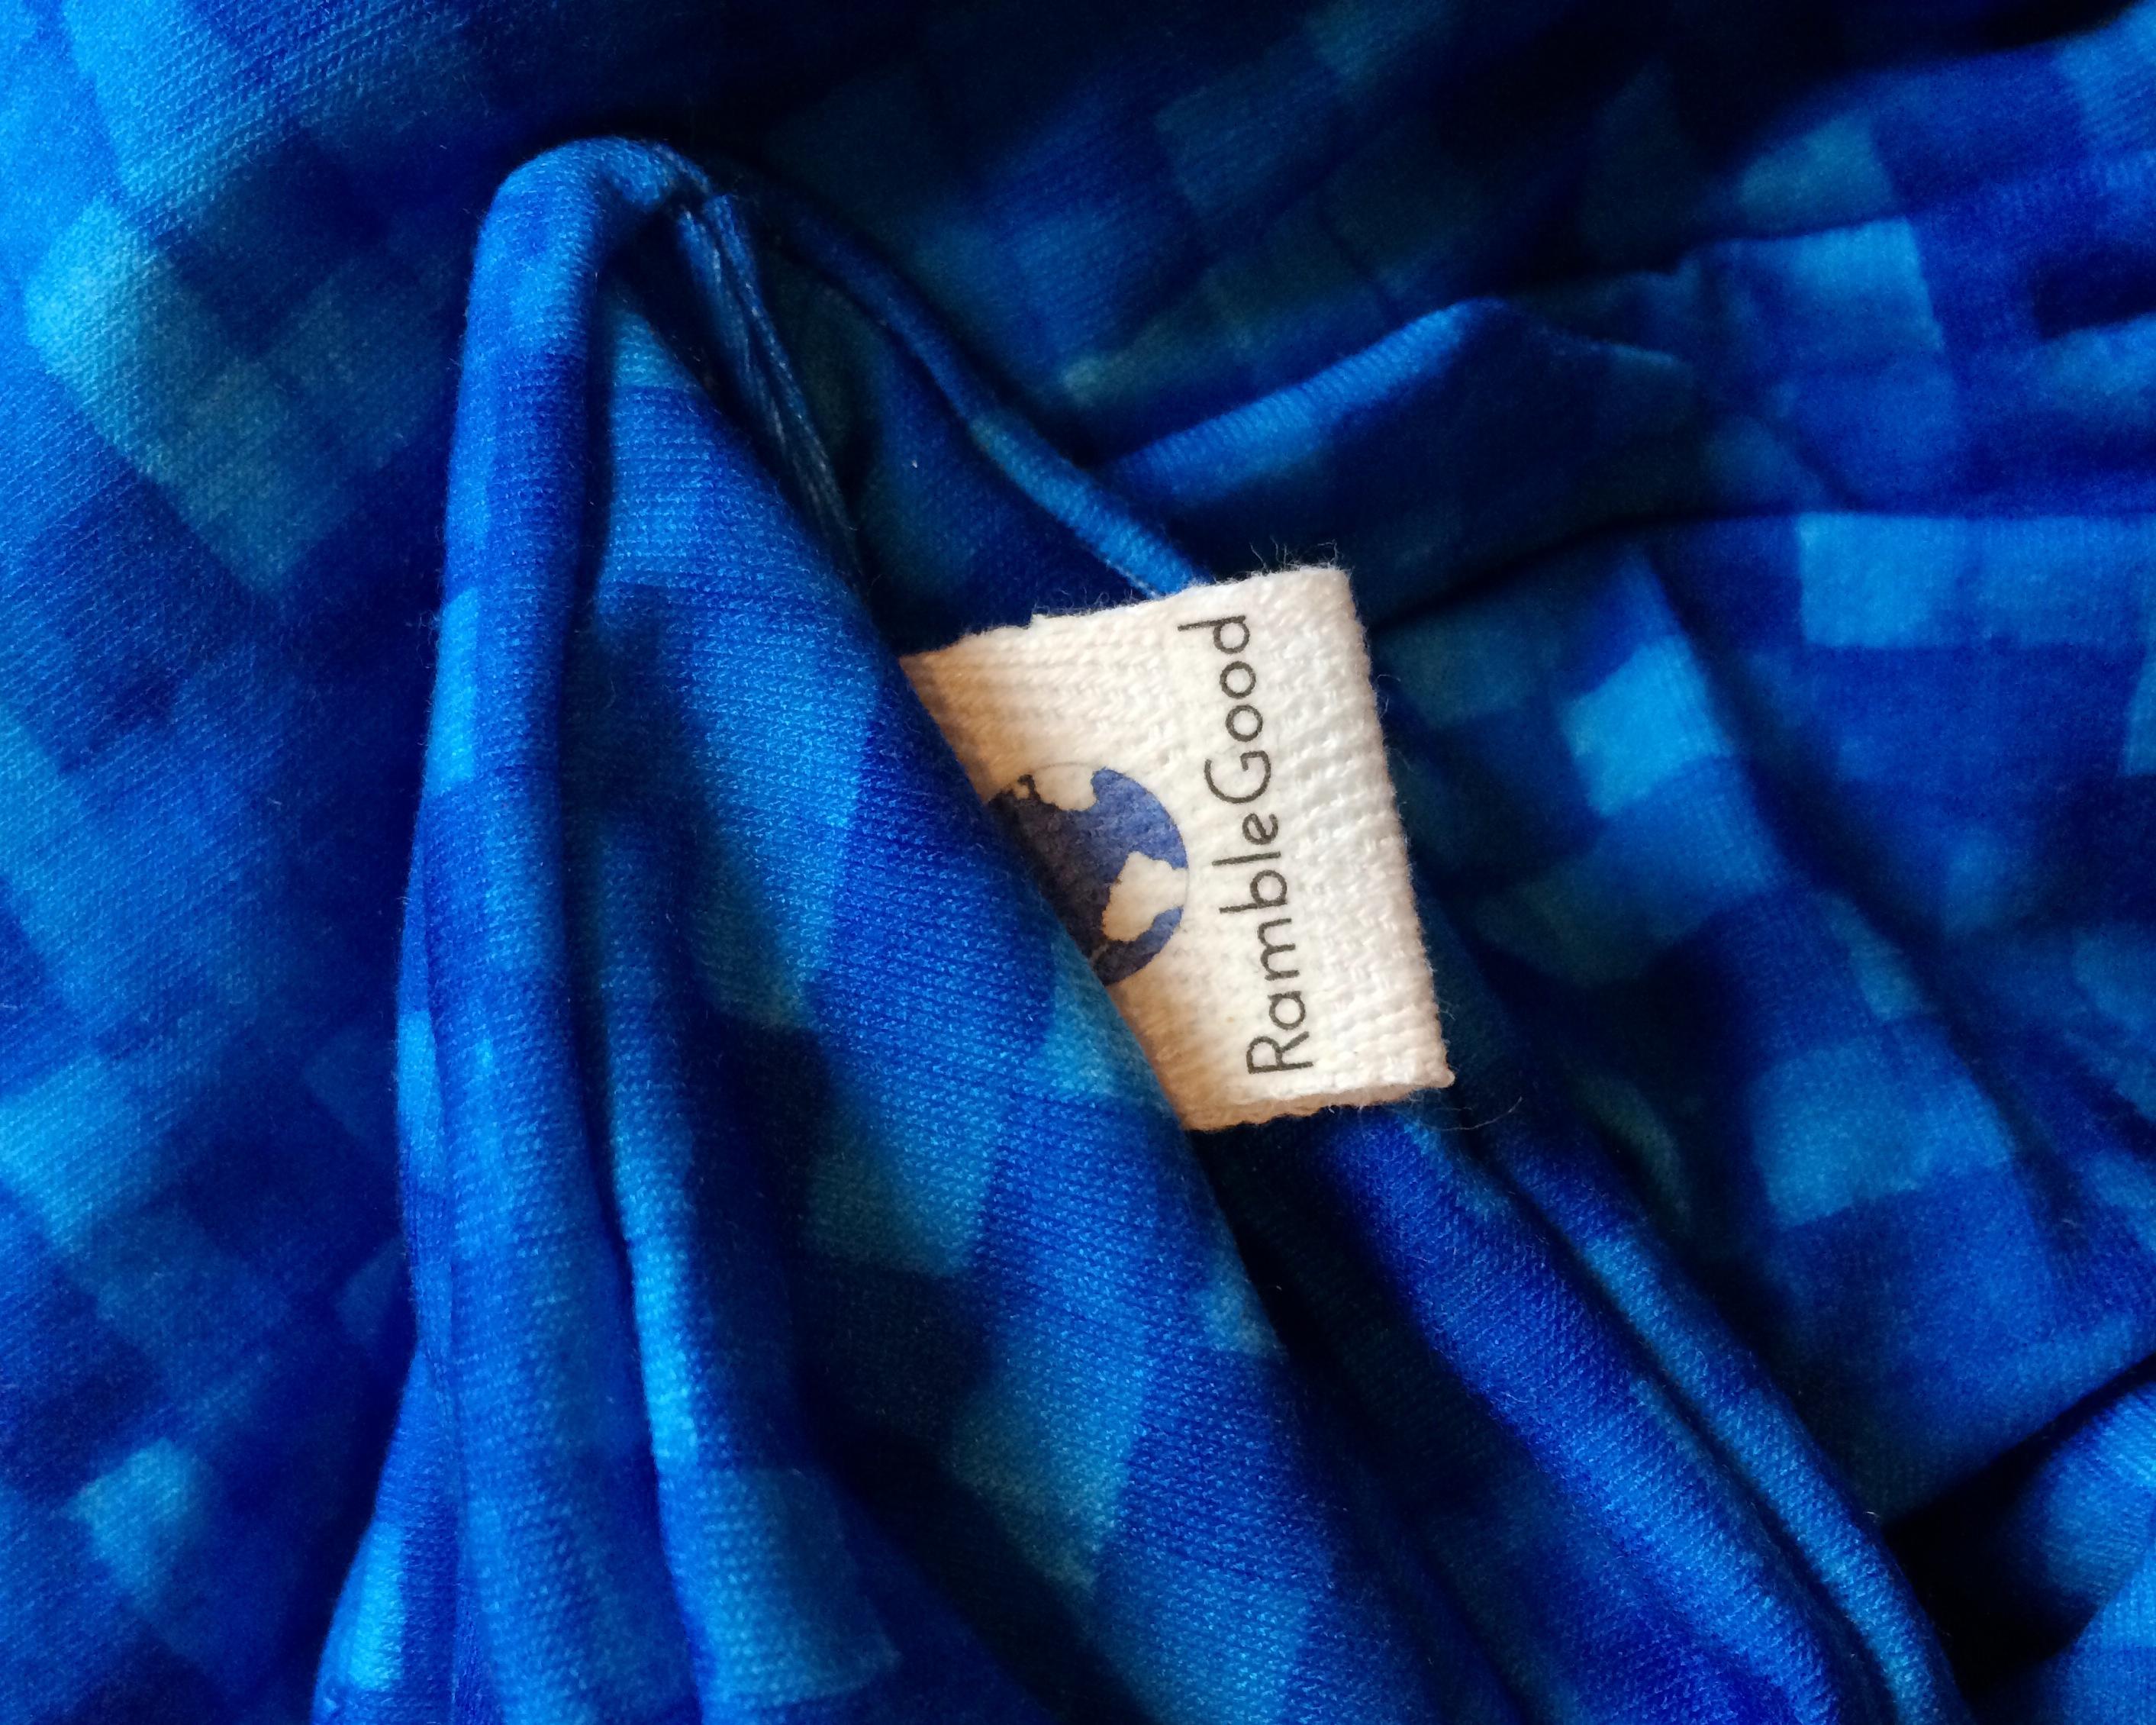 A ramblegood infinity scarf